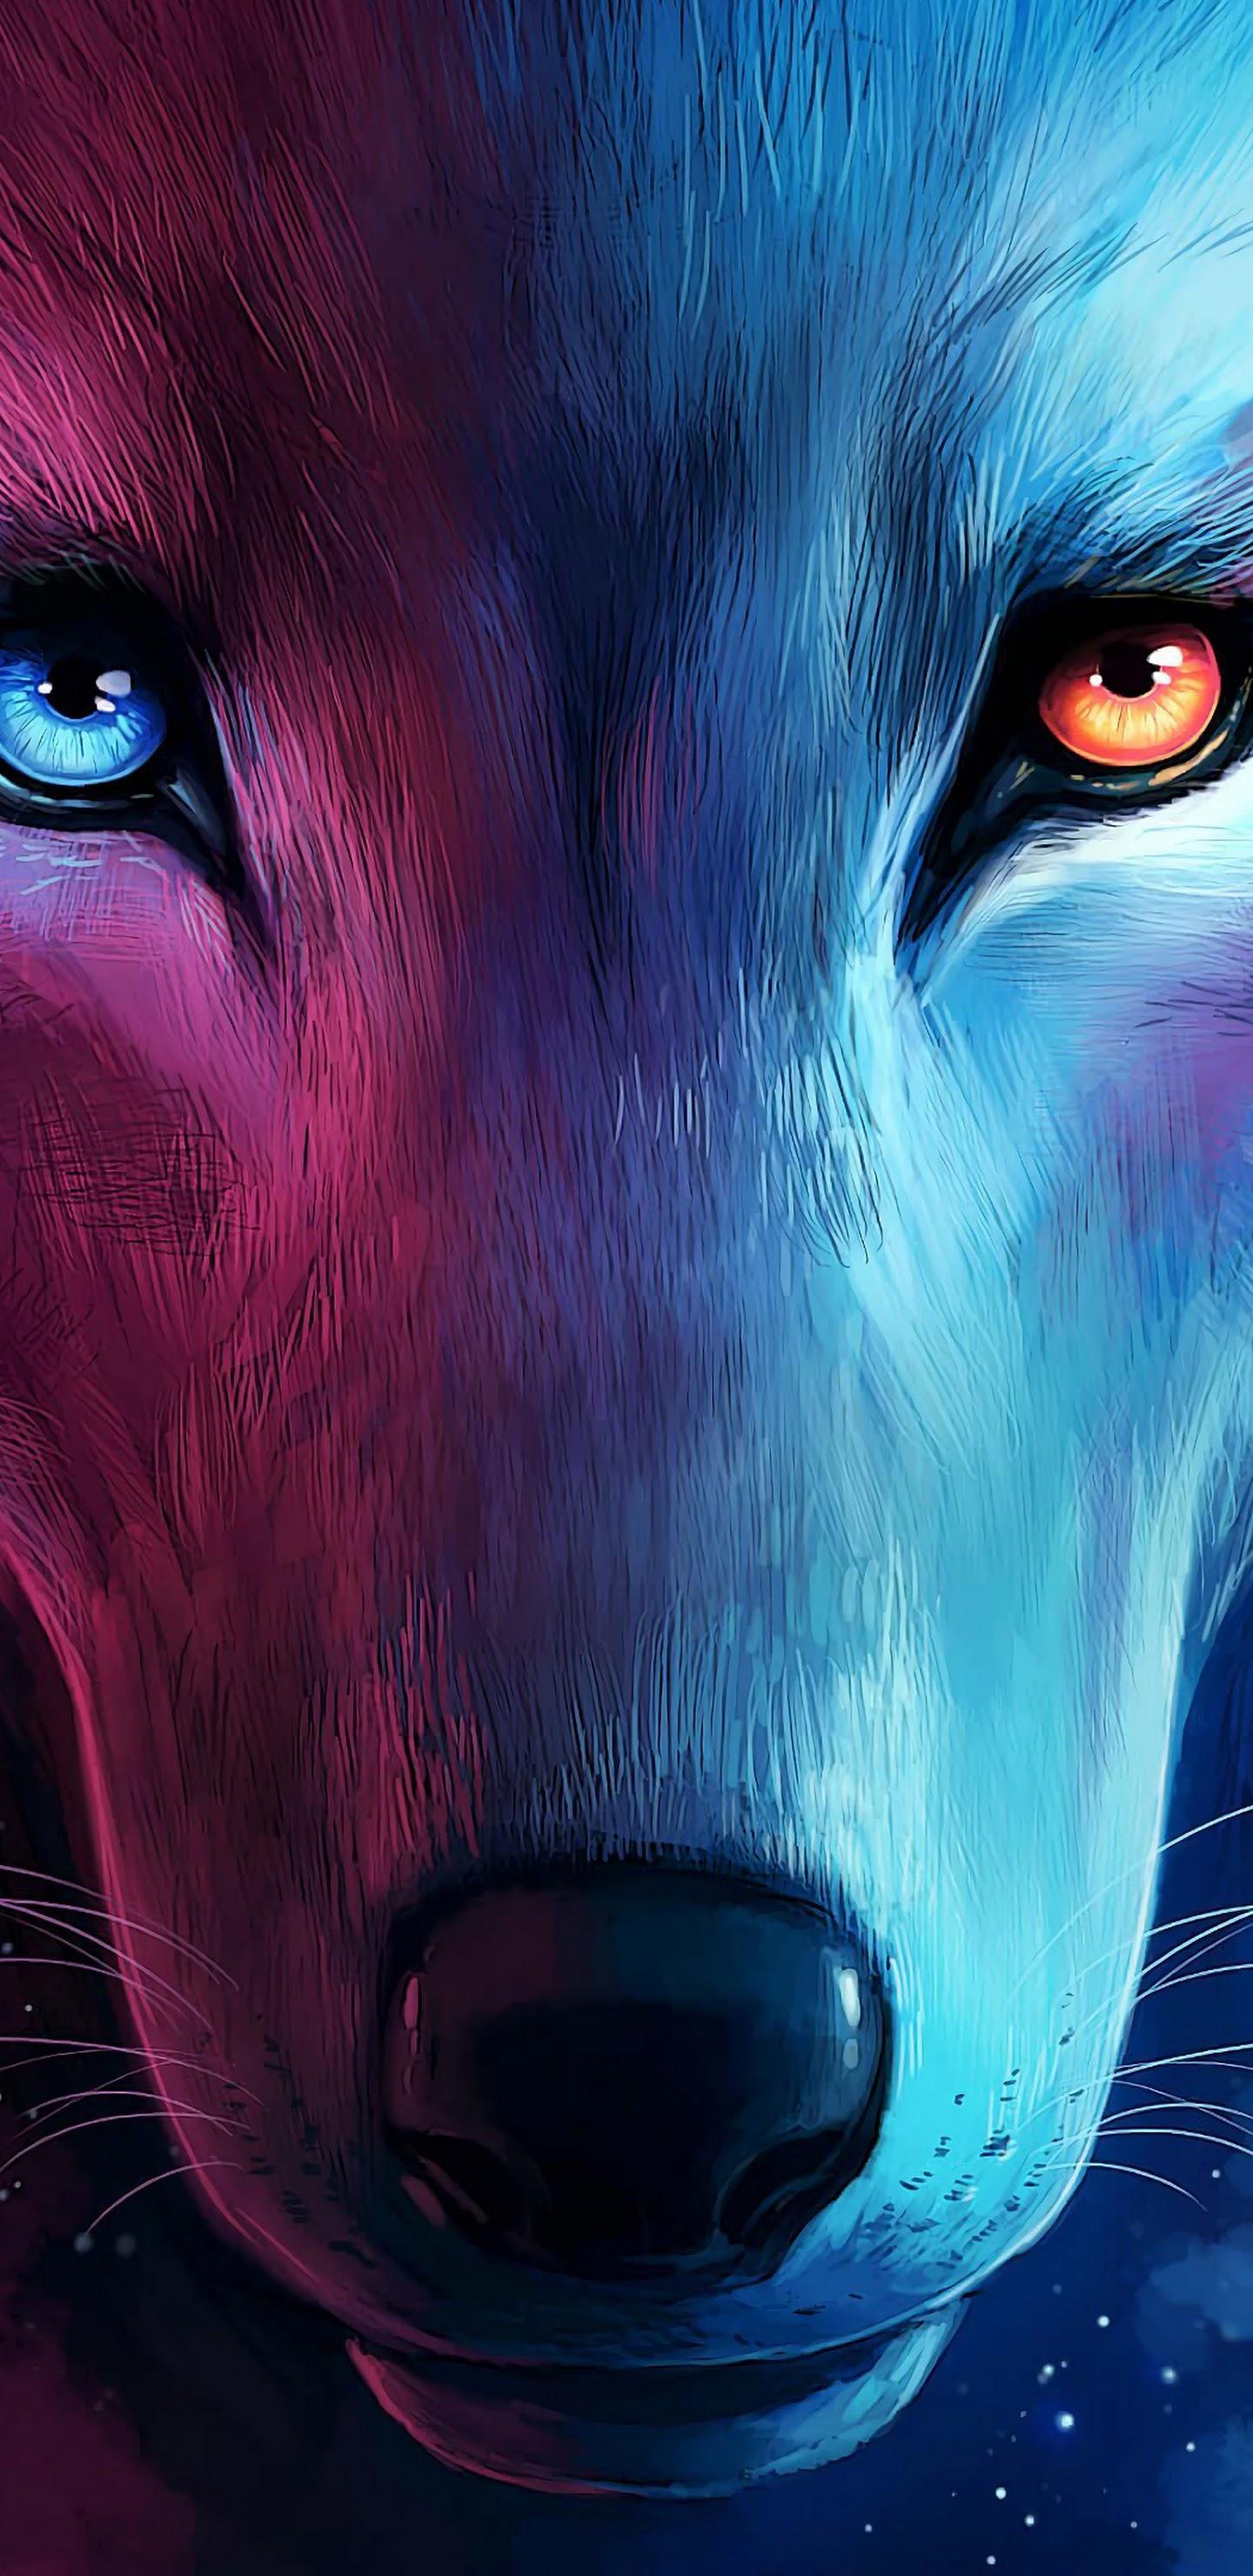 wolf fantasy art uhdpaper.com 4K 70